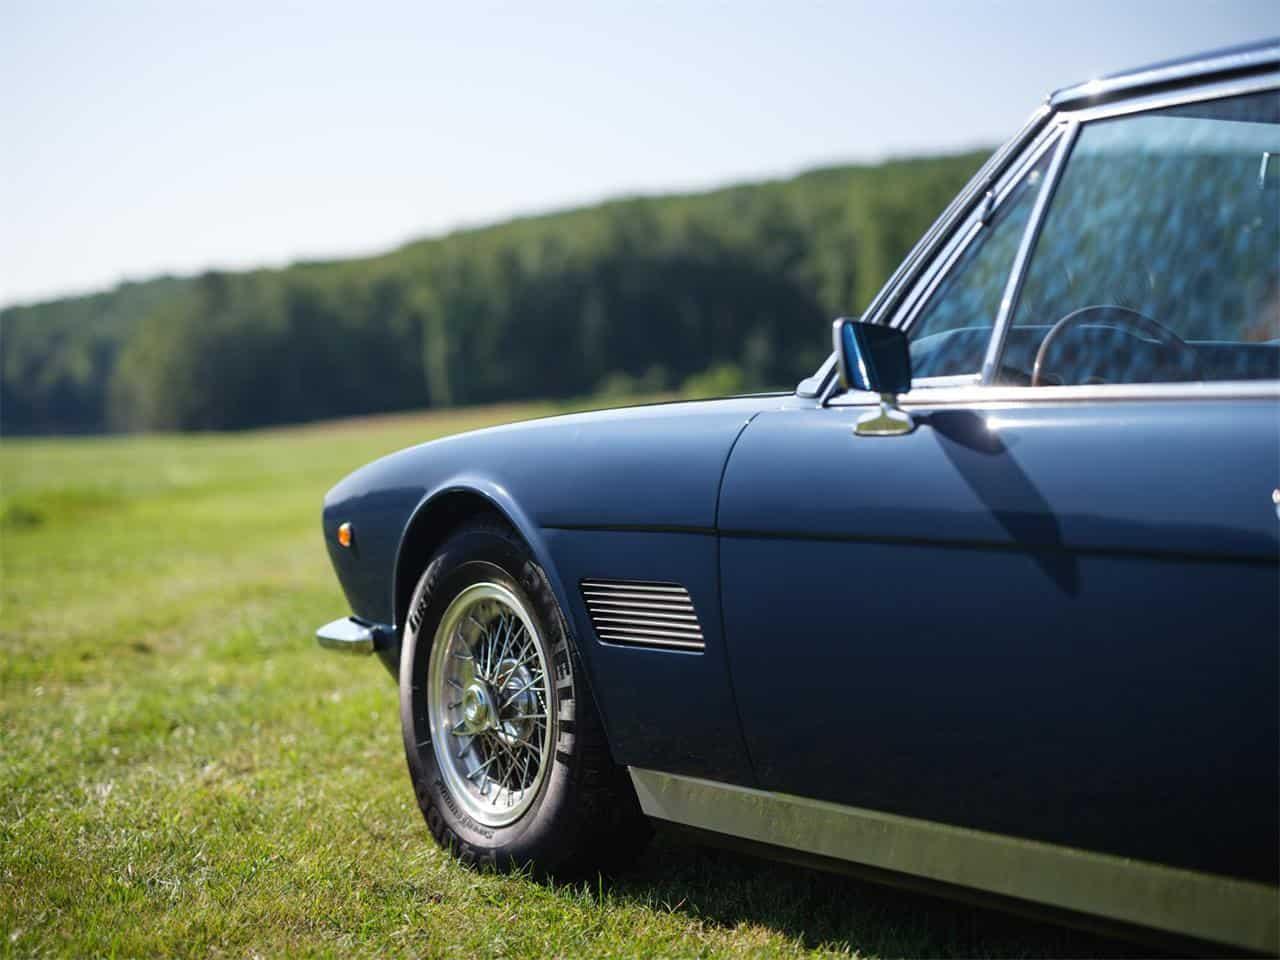 Maserati, Pick of the Day: 1969 Maserati Mexico, limited-production Italian sports car, ClassicCars.com Journal